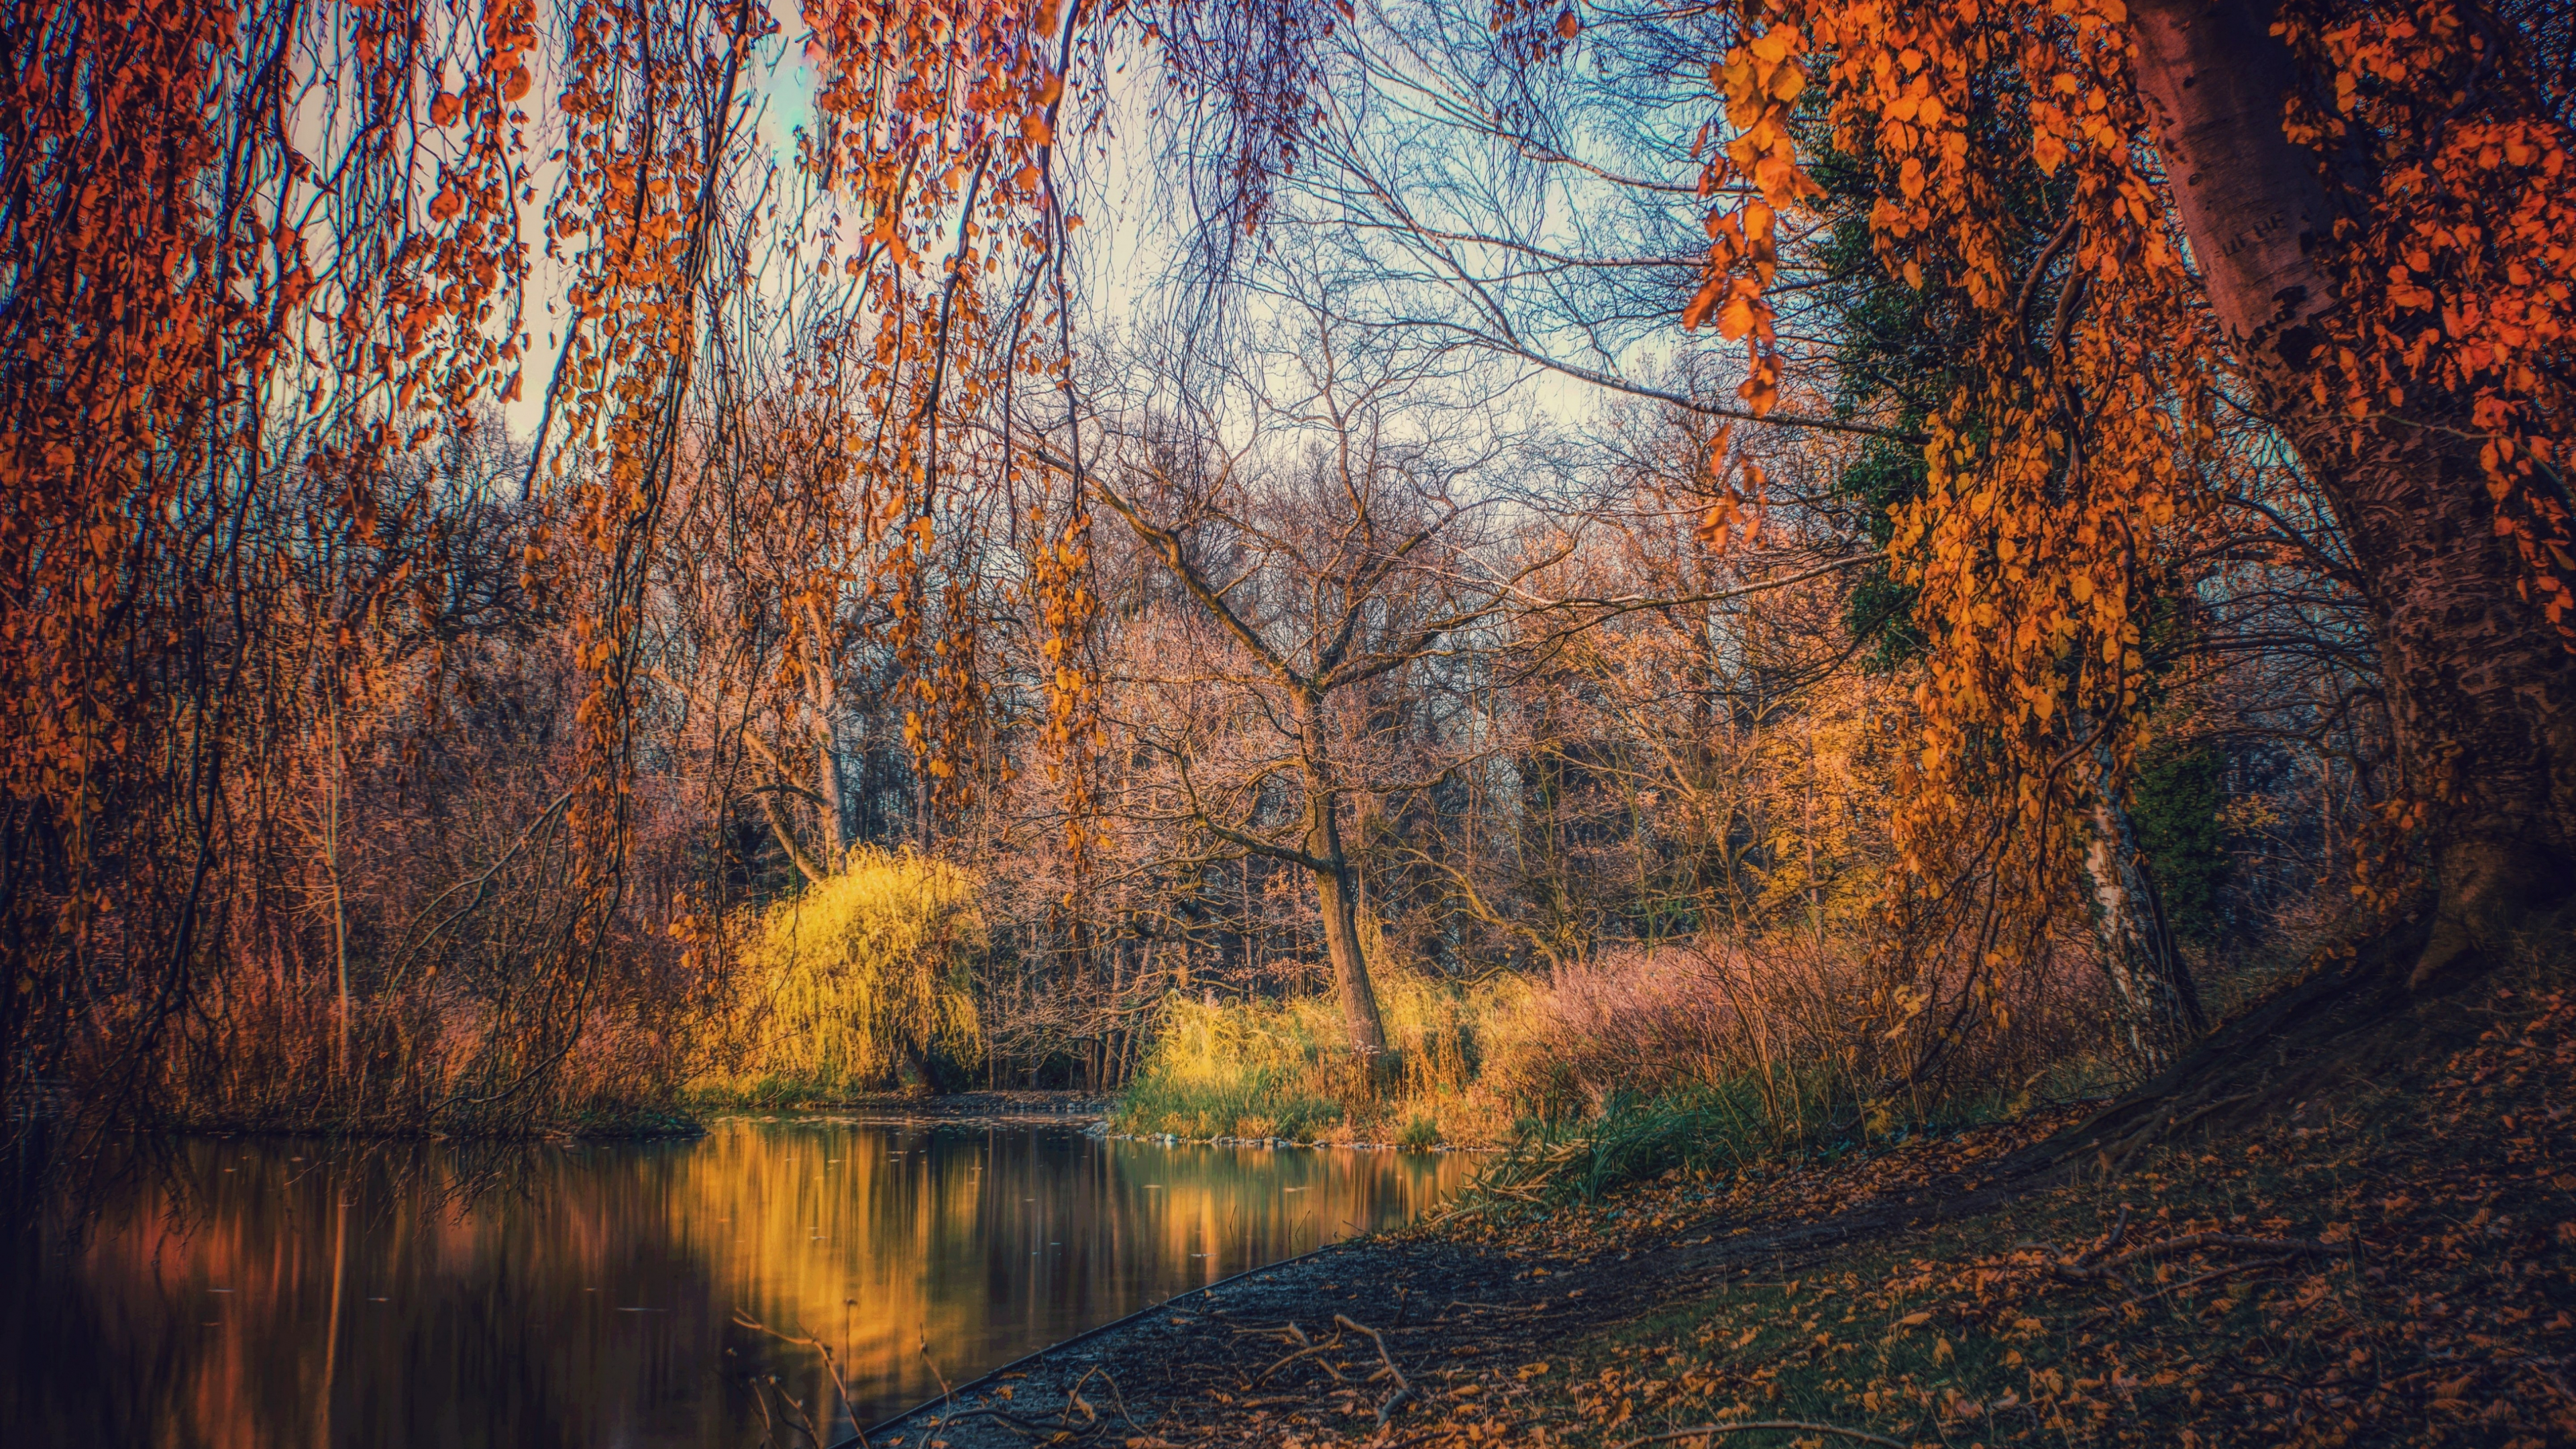 Download 3840x2160 wallpaper lake, nature, tree, autumn ...